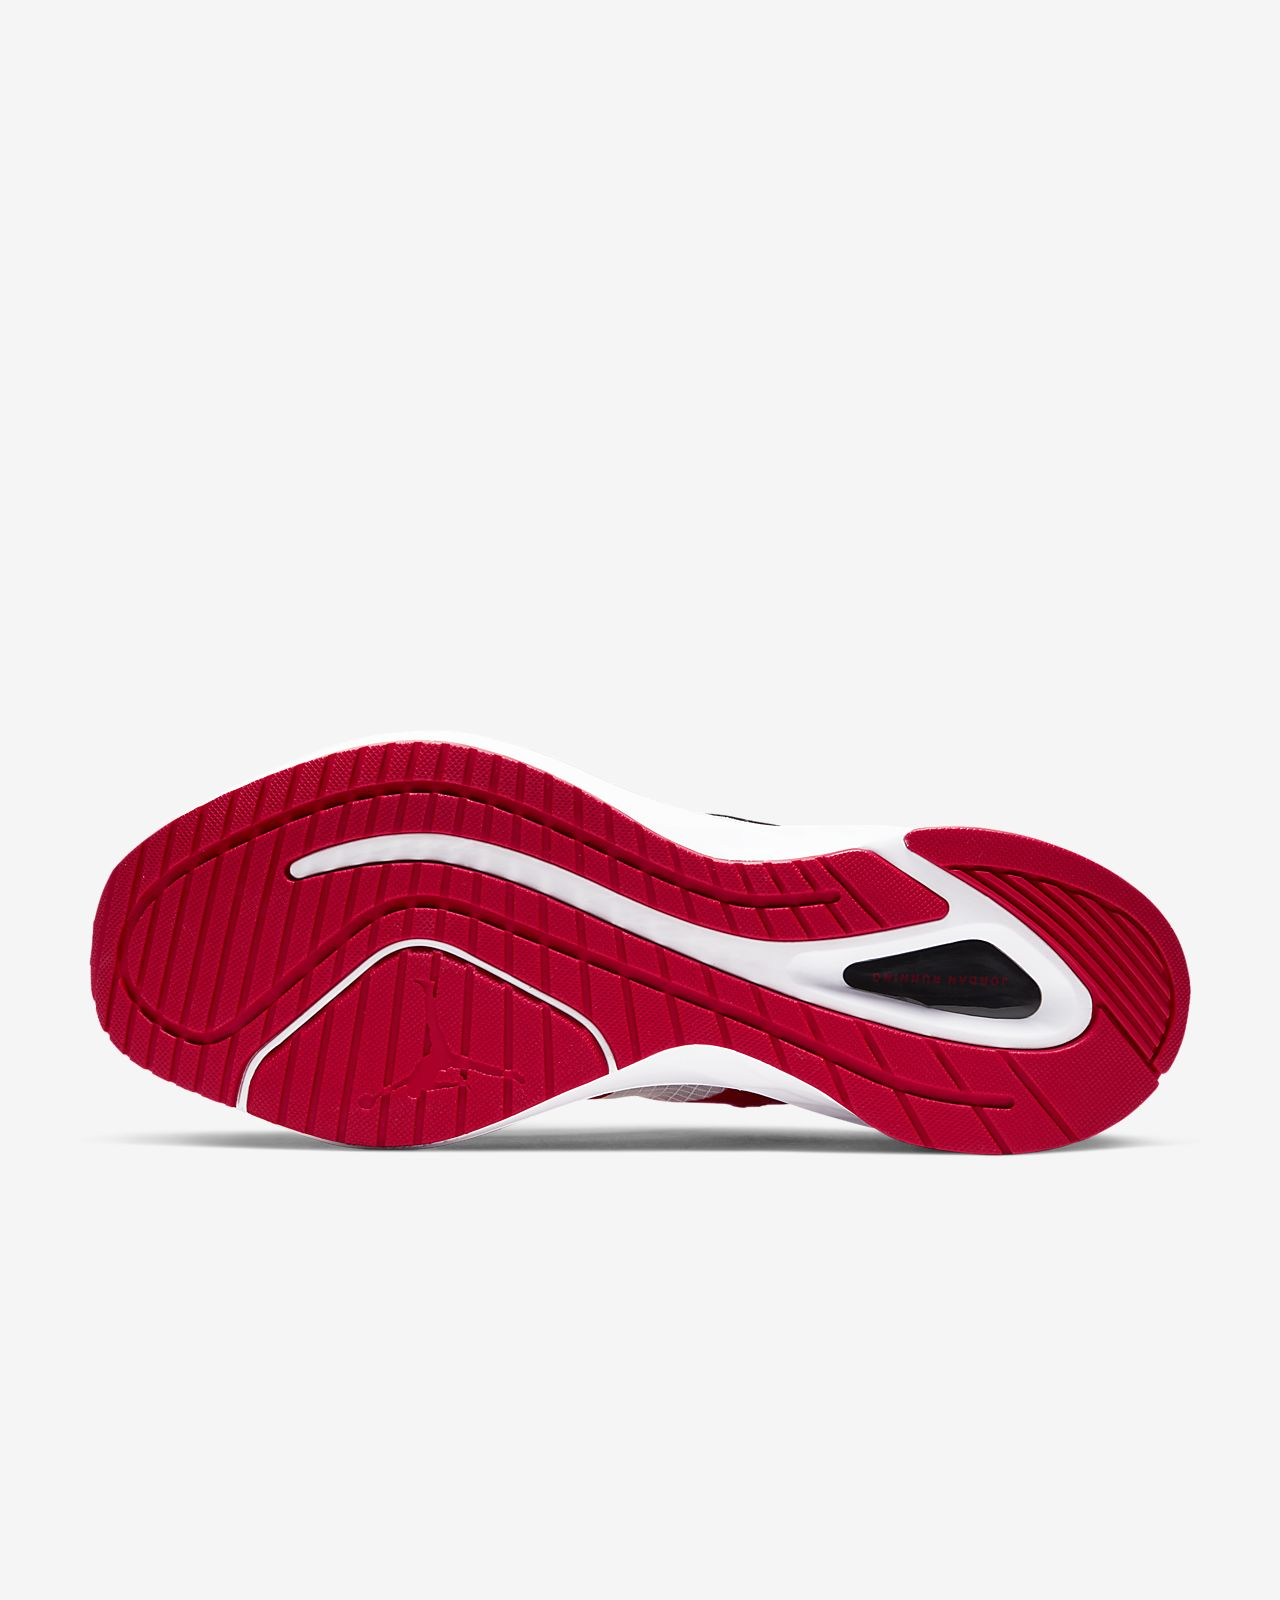 nike jordan shoe